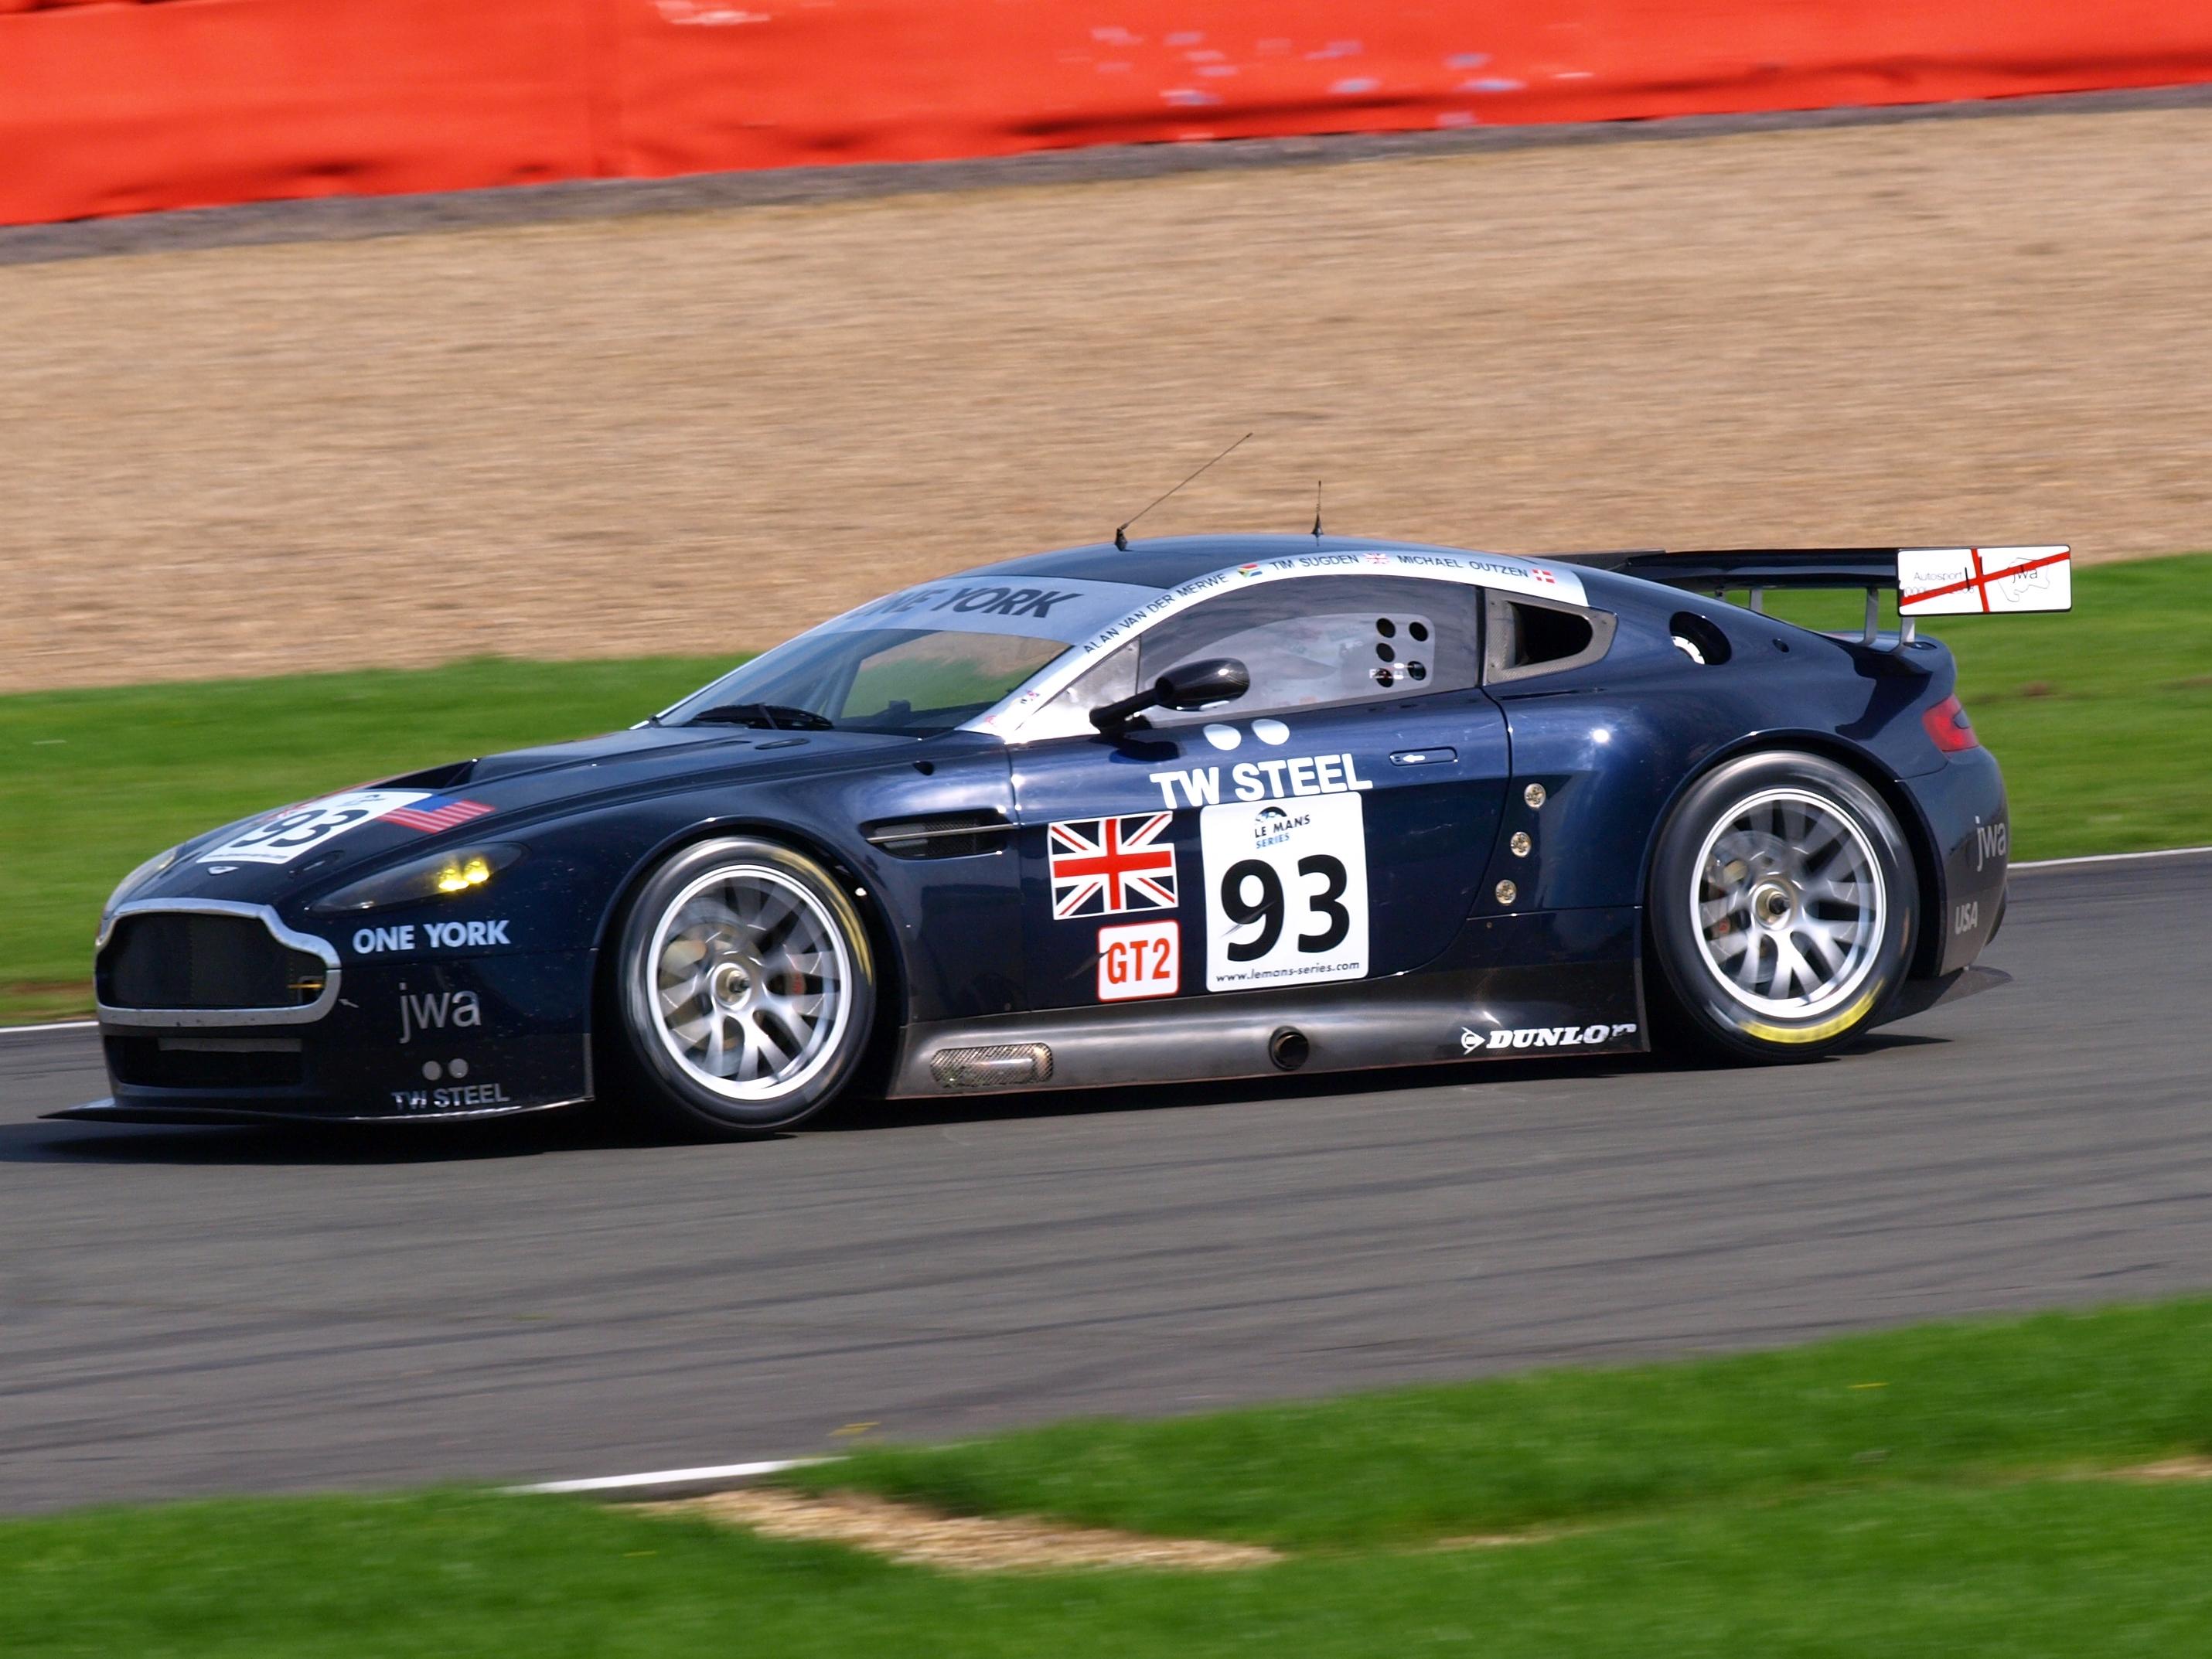 Nice wallpapers Aston Martin Vantage GT2 2861x2146px